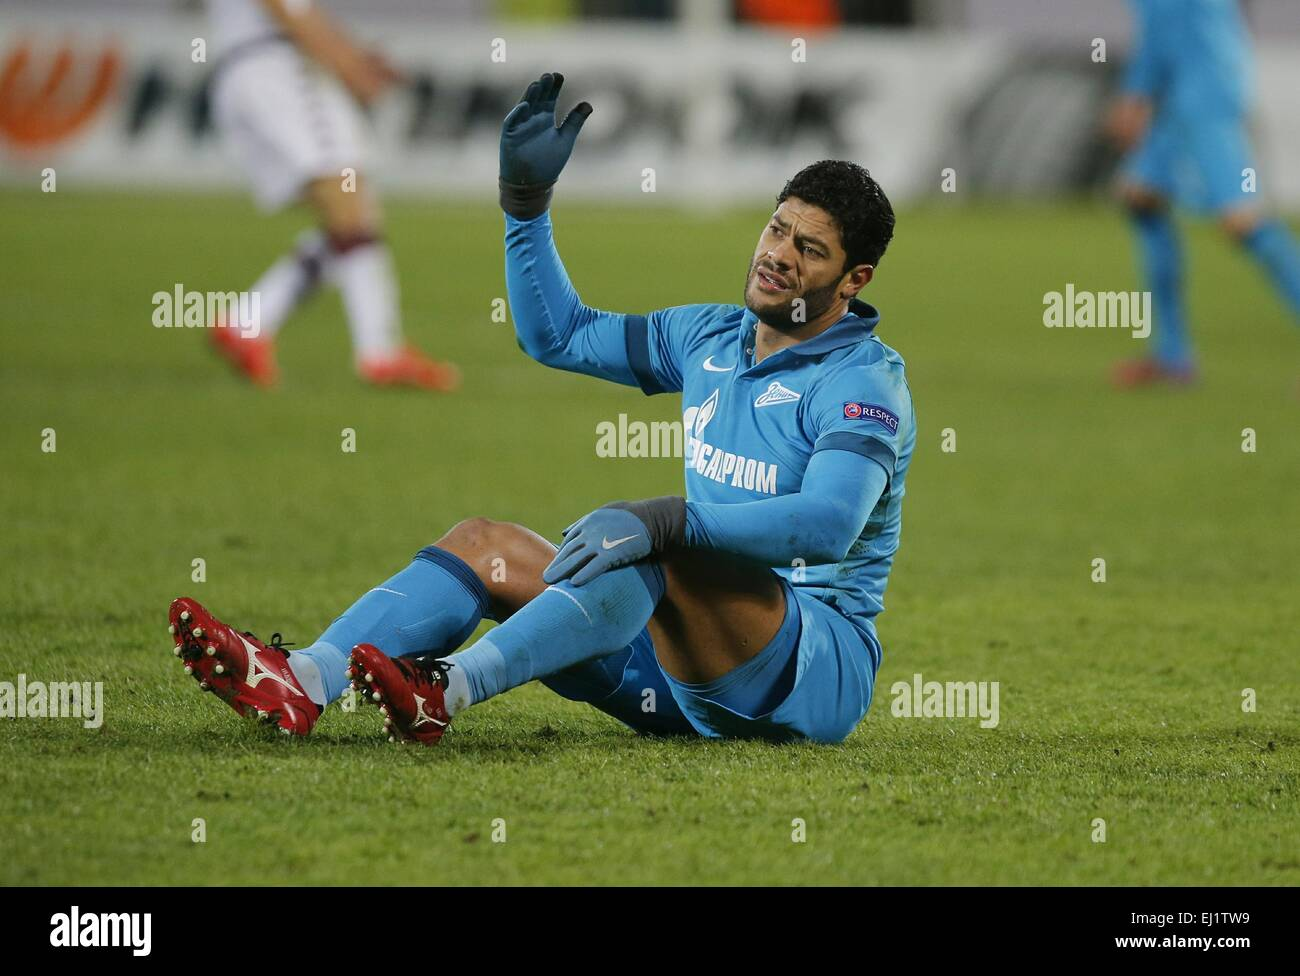 f03093a4 Europa League 2014/15. 1/8 final. FC Zenit San Petersburgo vs Torino F.C.,  2:0. En la foto: FC Zenit jugador Hulk (7).